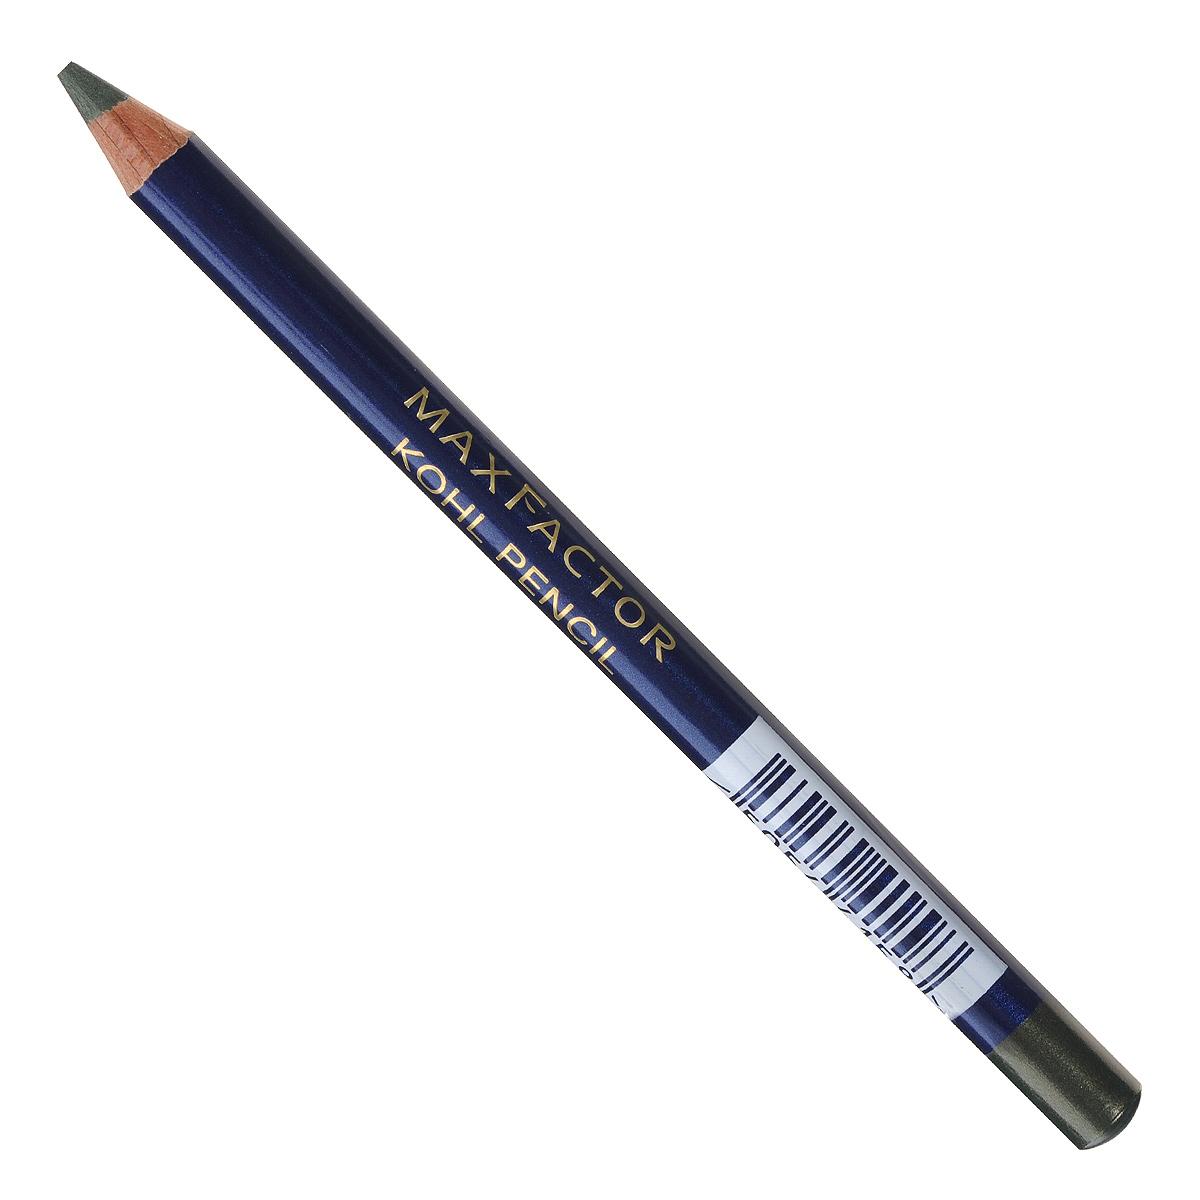 Max Factor Карандаш для глаз Kohl Pencil, тон №070 Olive, цвет: оливковый max factor карандаш для глаз kohl pencil тон 050 charcoal grey цвет темно серый